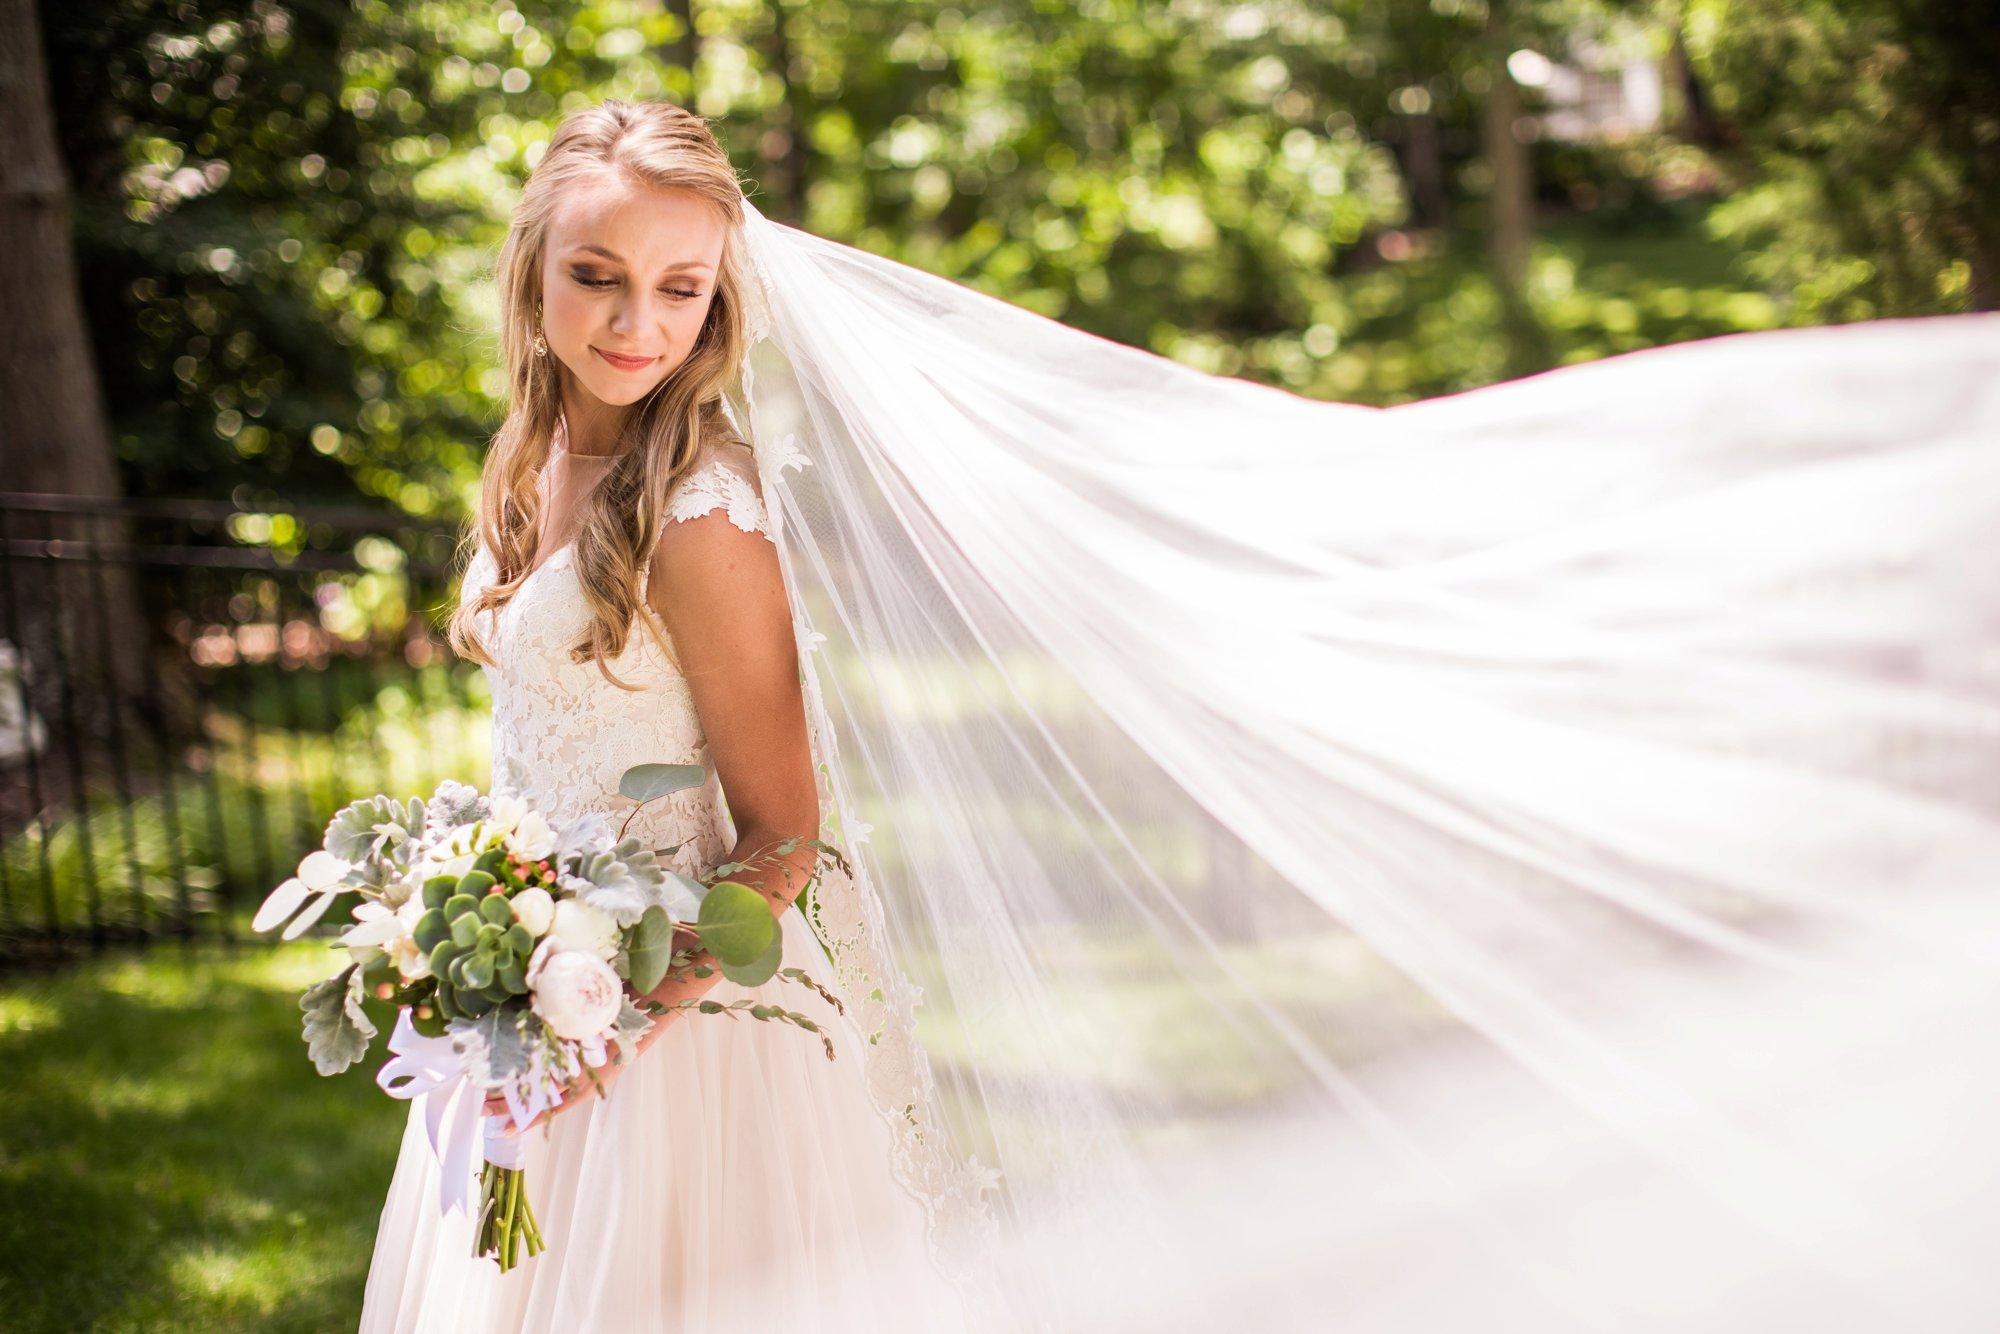 wedding-photography-88-love-stories_0015.jpg